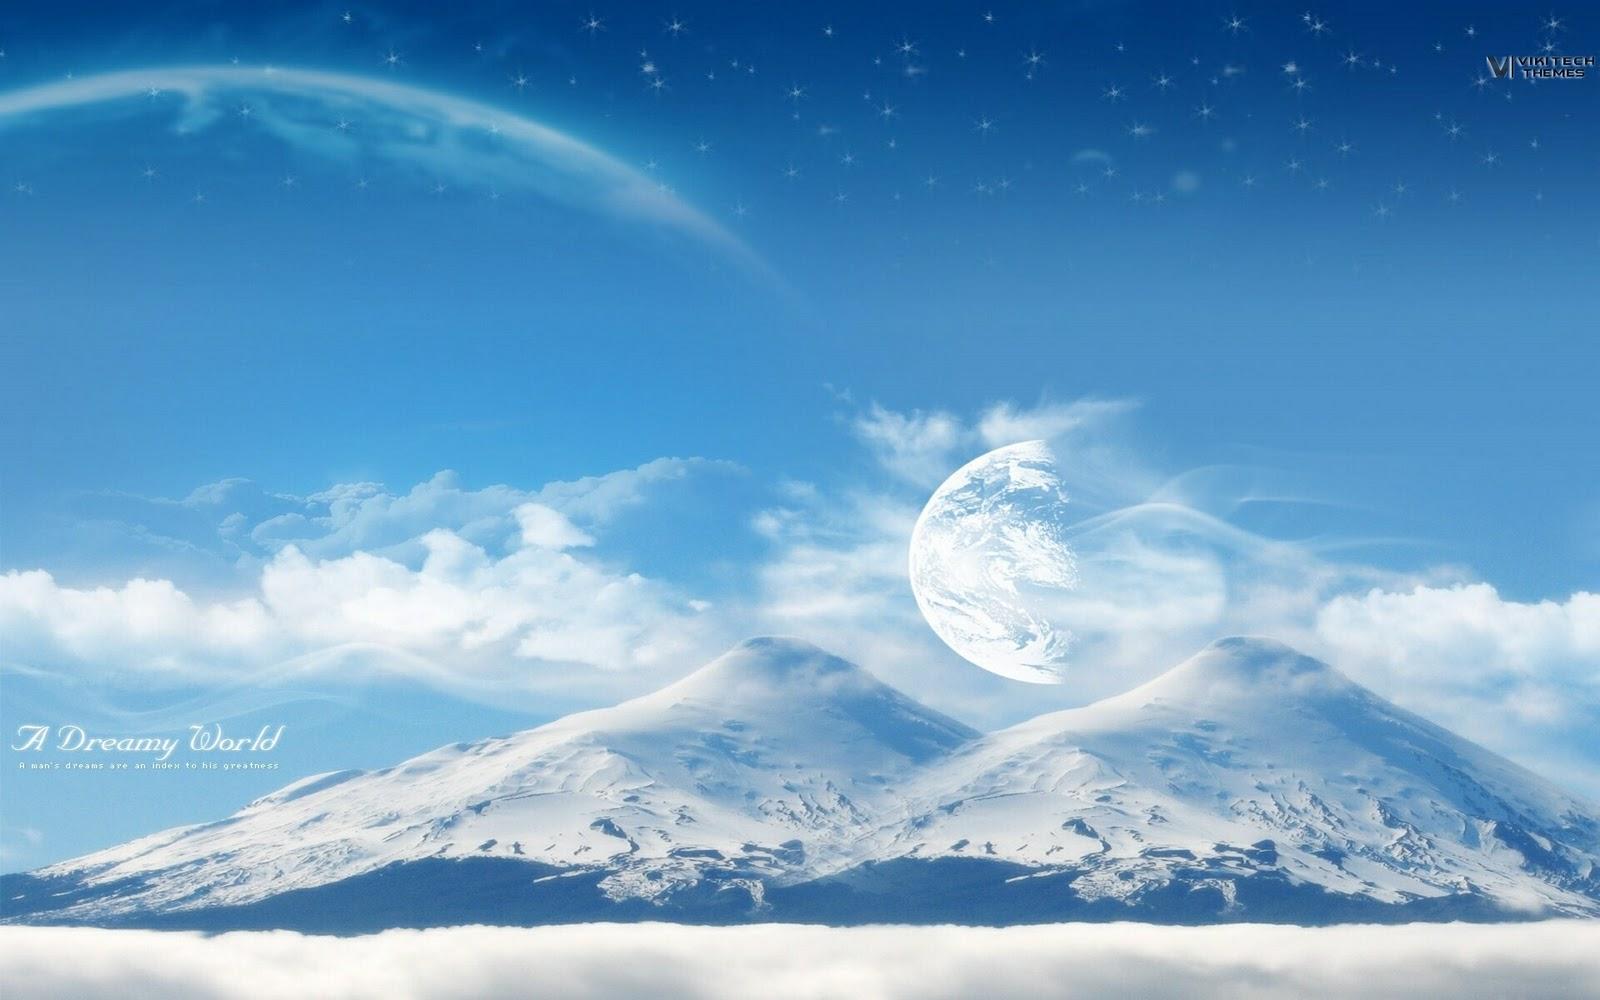 Paisajes y Planetas Imagenes HD - Elegantes Wallpapers (32 ...